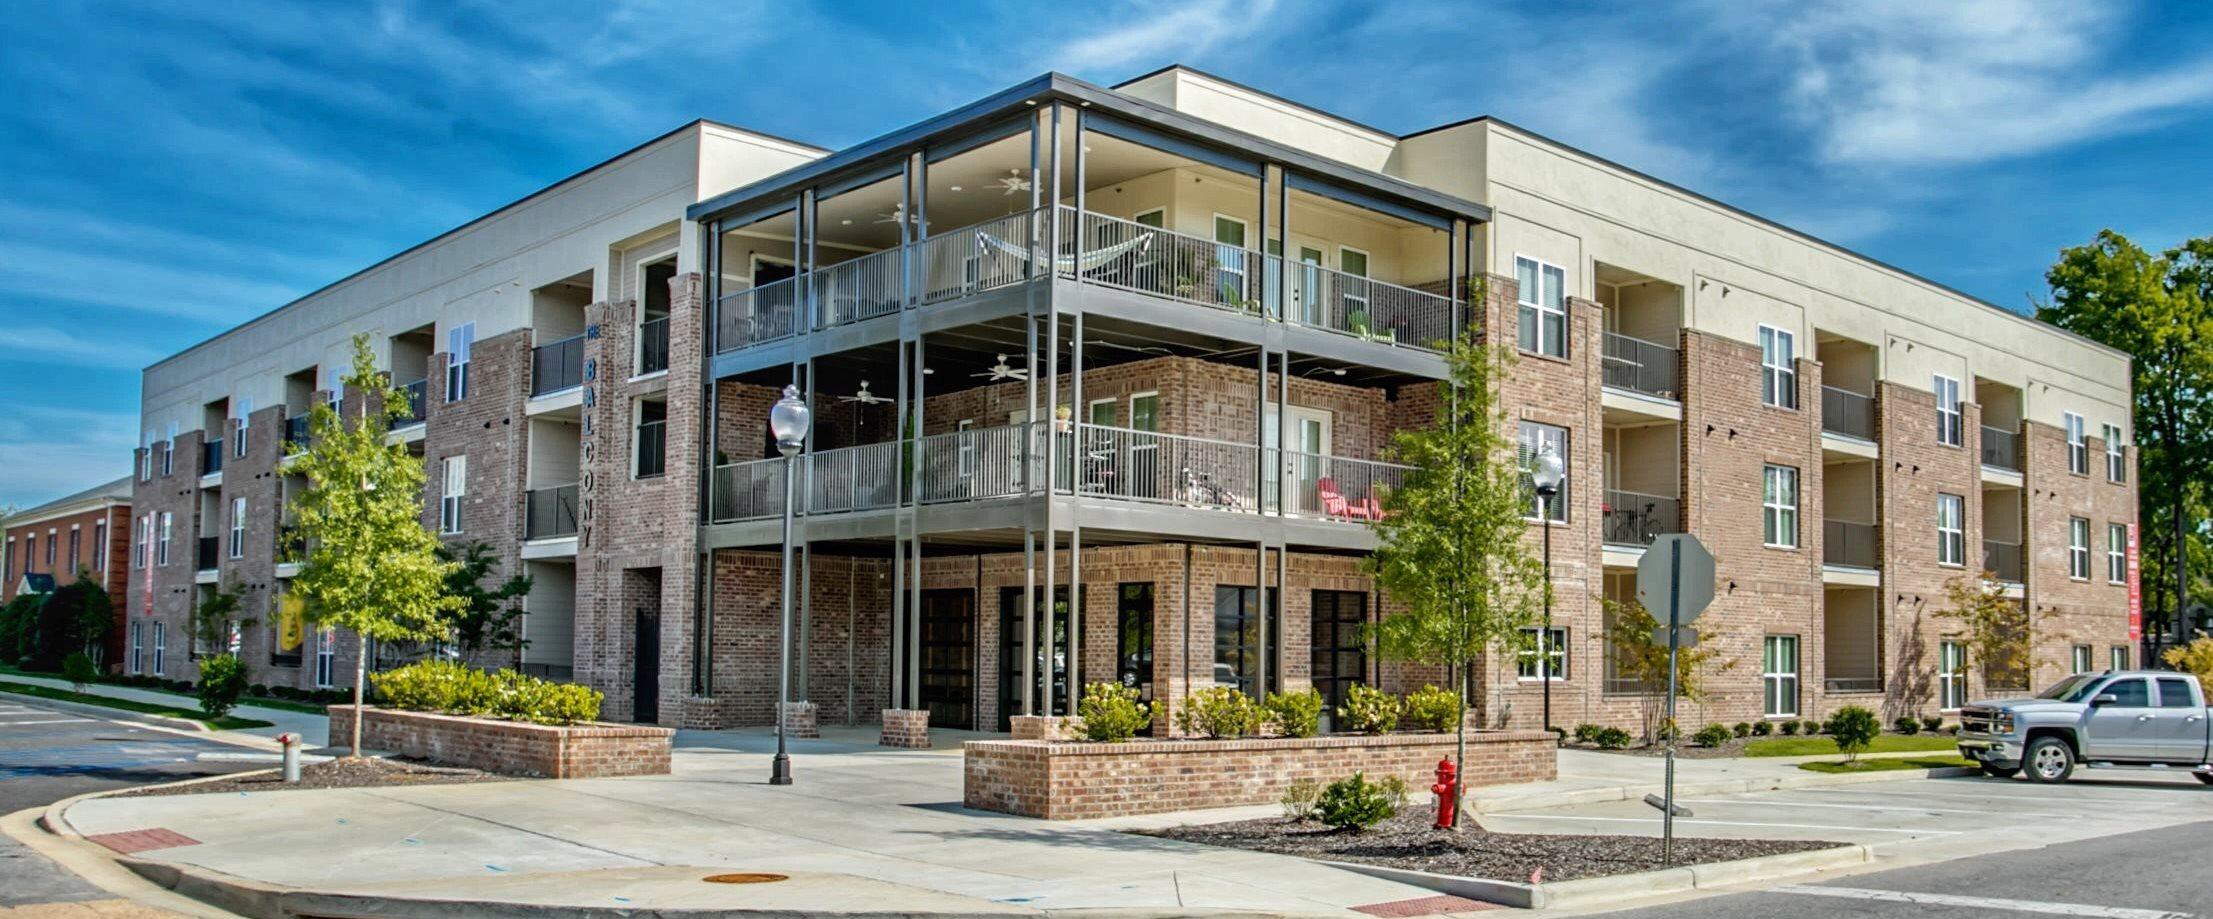 Exterior of The Balcony Apartments in Tuscaloosa, AL